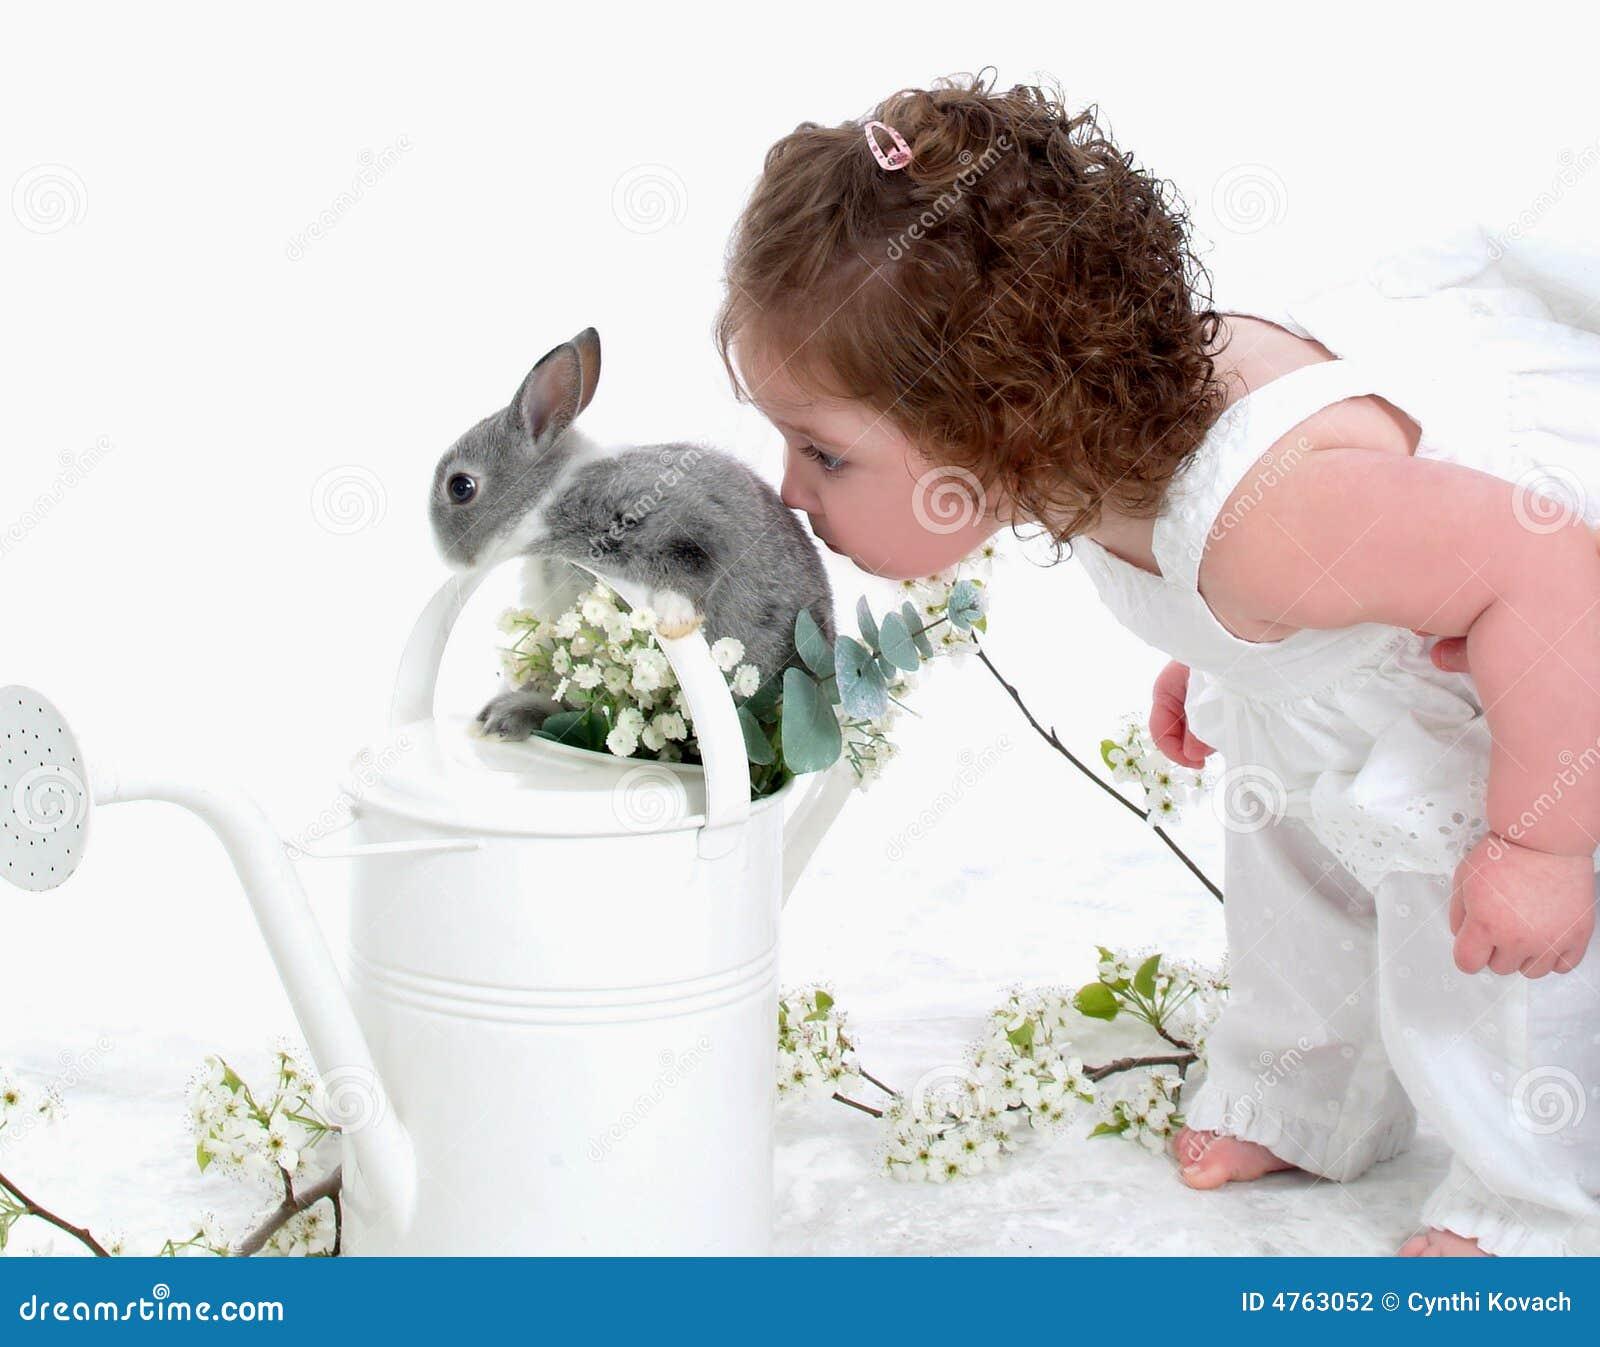 Baby Kissing Bunny